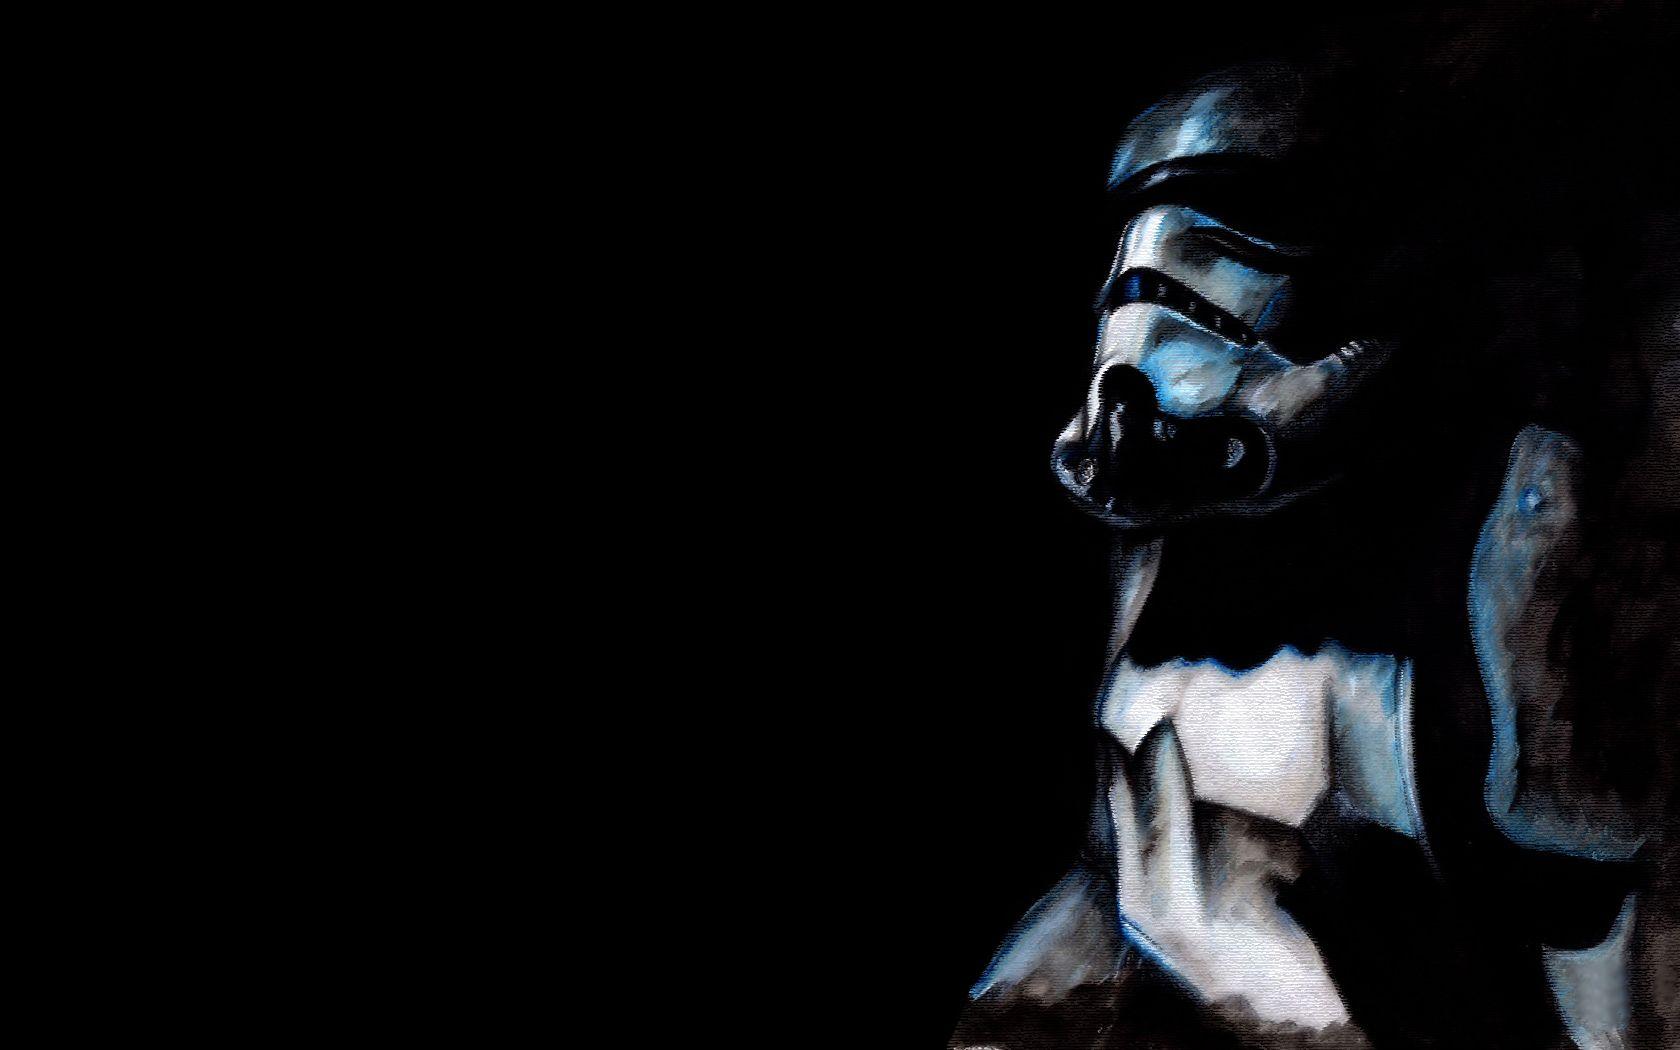 Star Wars Logo Wallpaper Hd « Wallpapers Wide, HD (High